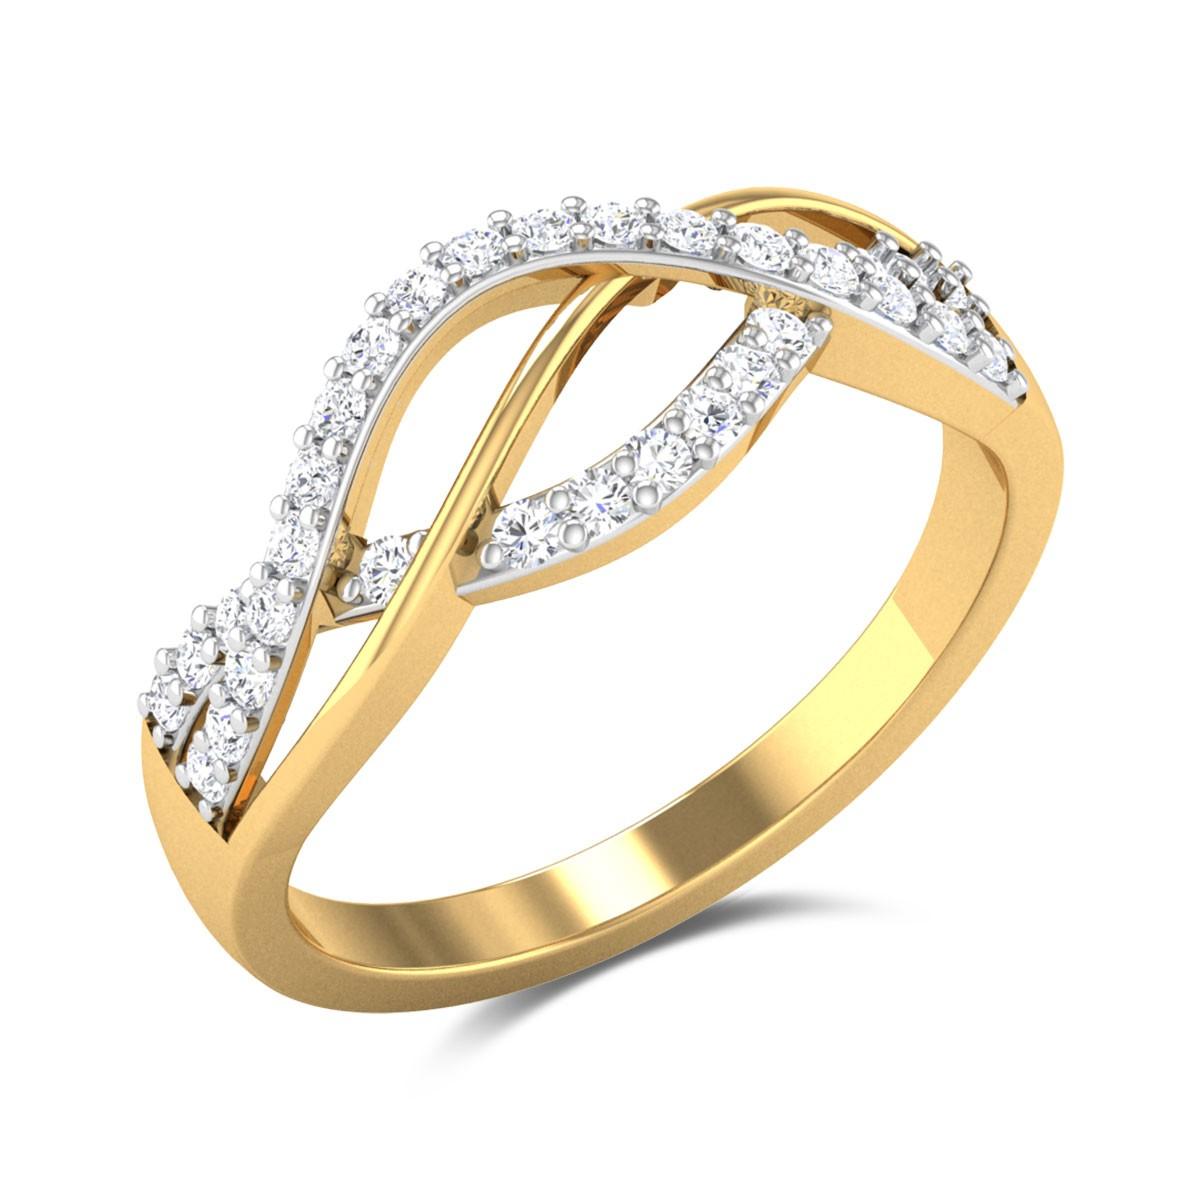 Maegan Diamond Ring